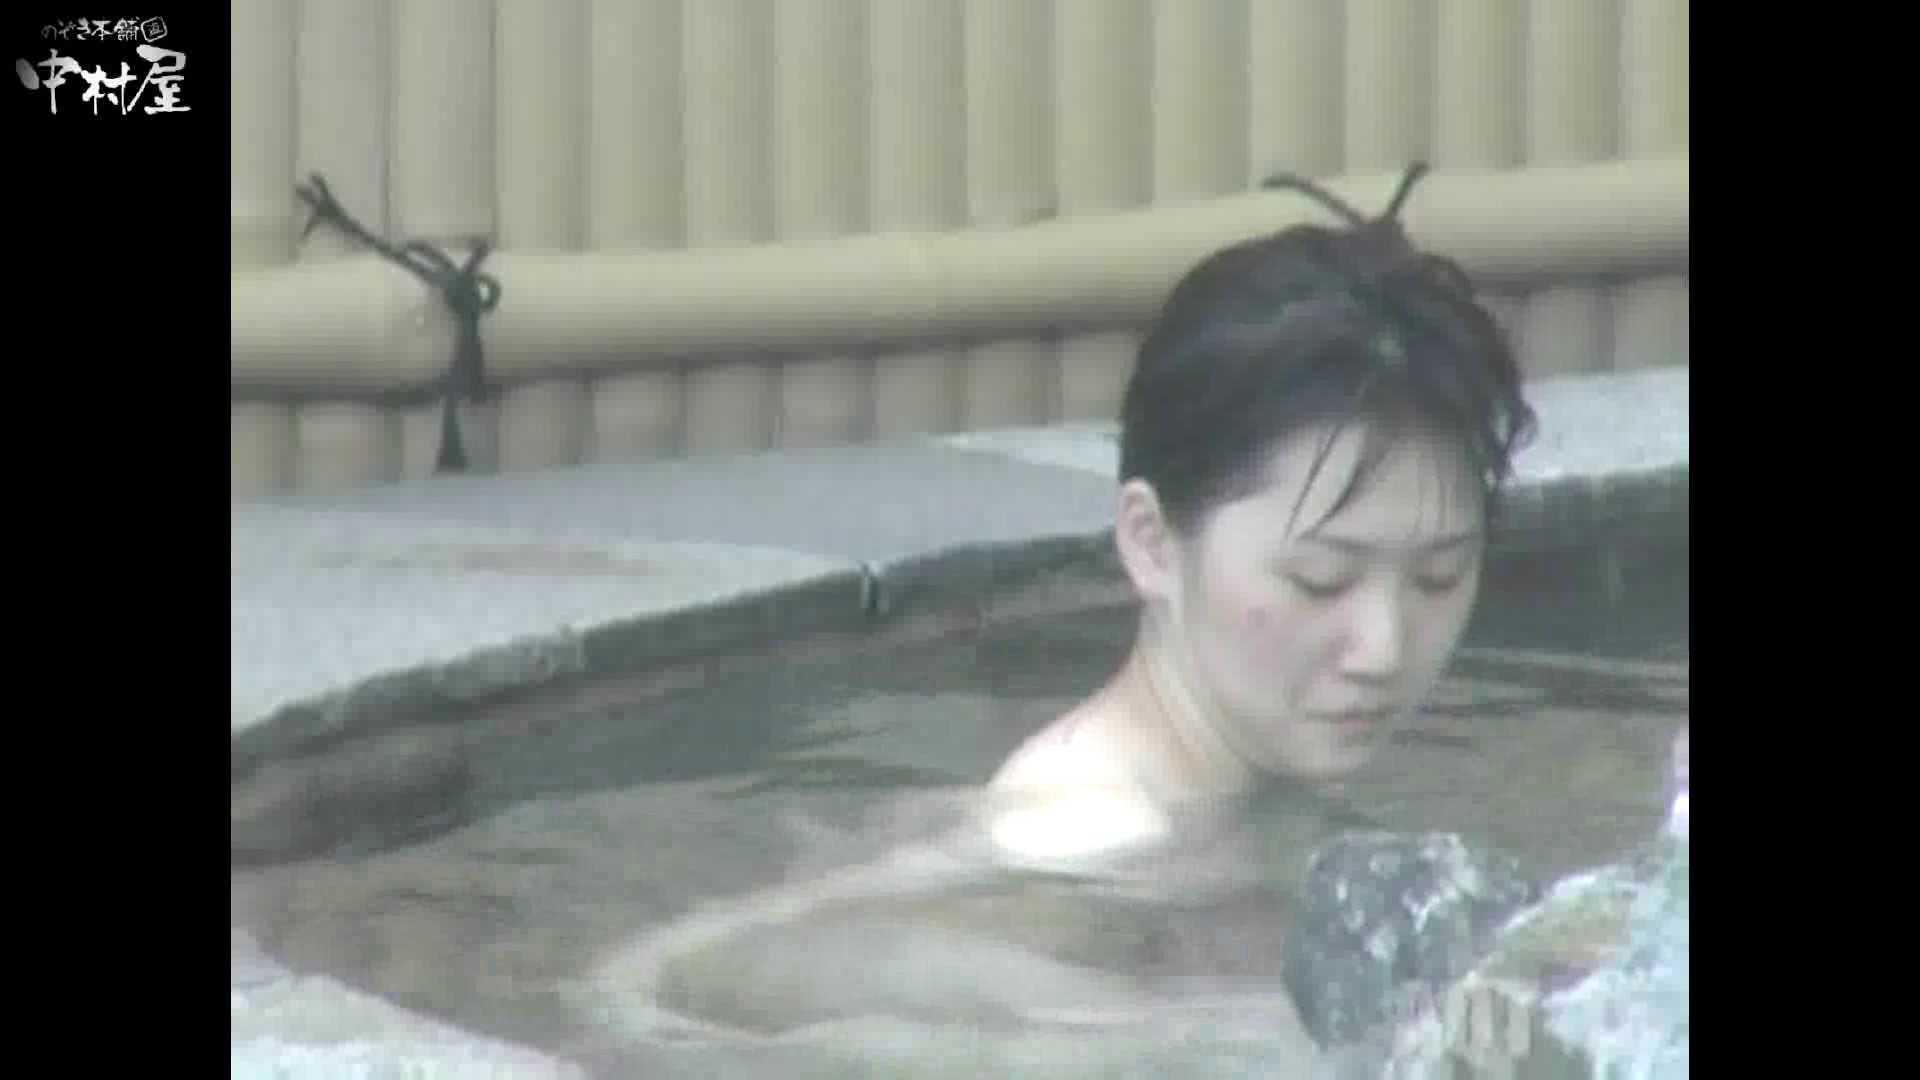 Aquaな露天風呂Vol.878潜入盗撮露天風呂十五判湯 其の一 露天風呂突入 | 美しいOLの裸体  74pic 49